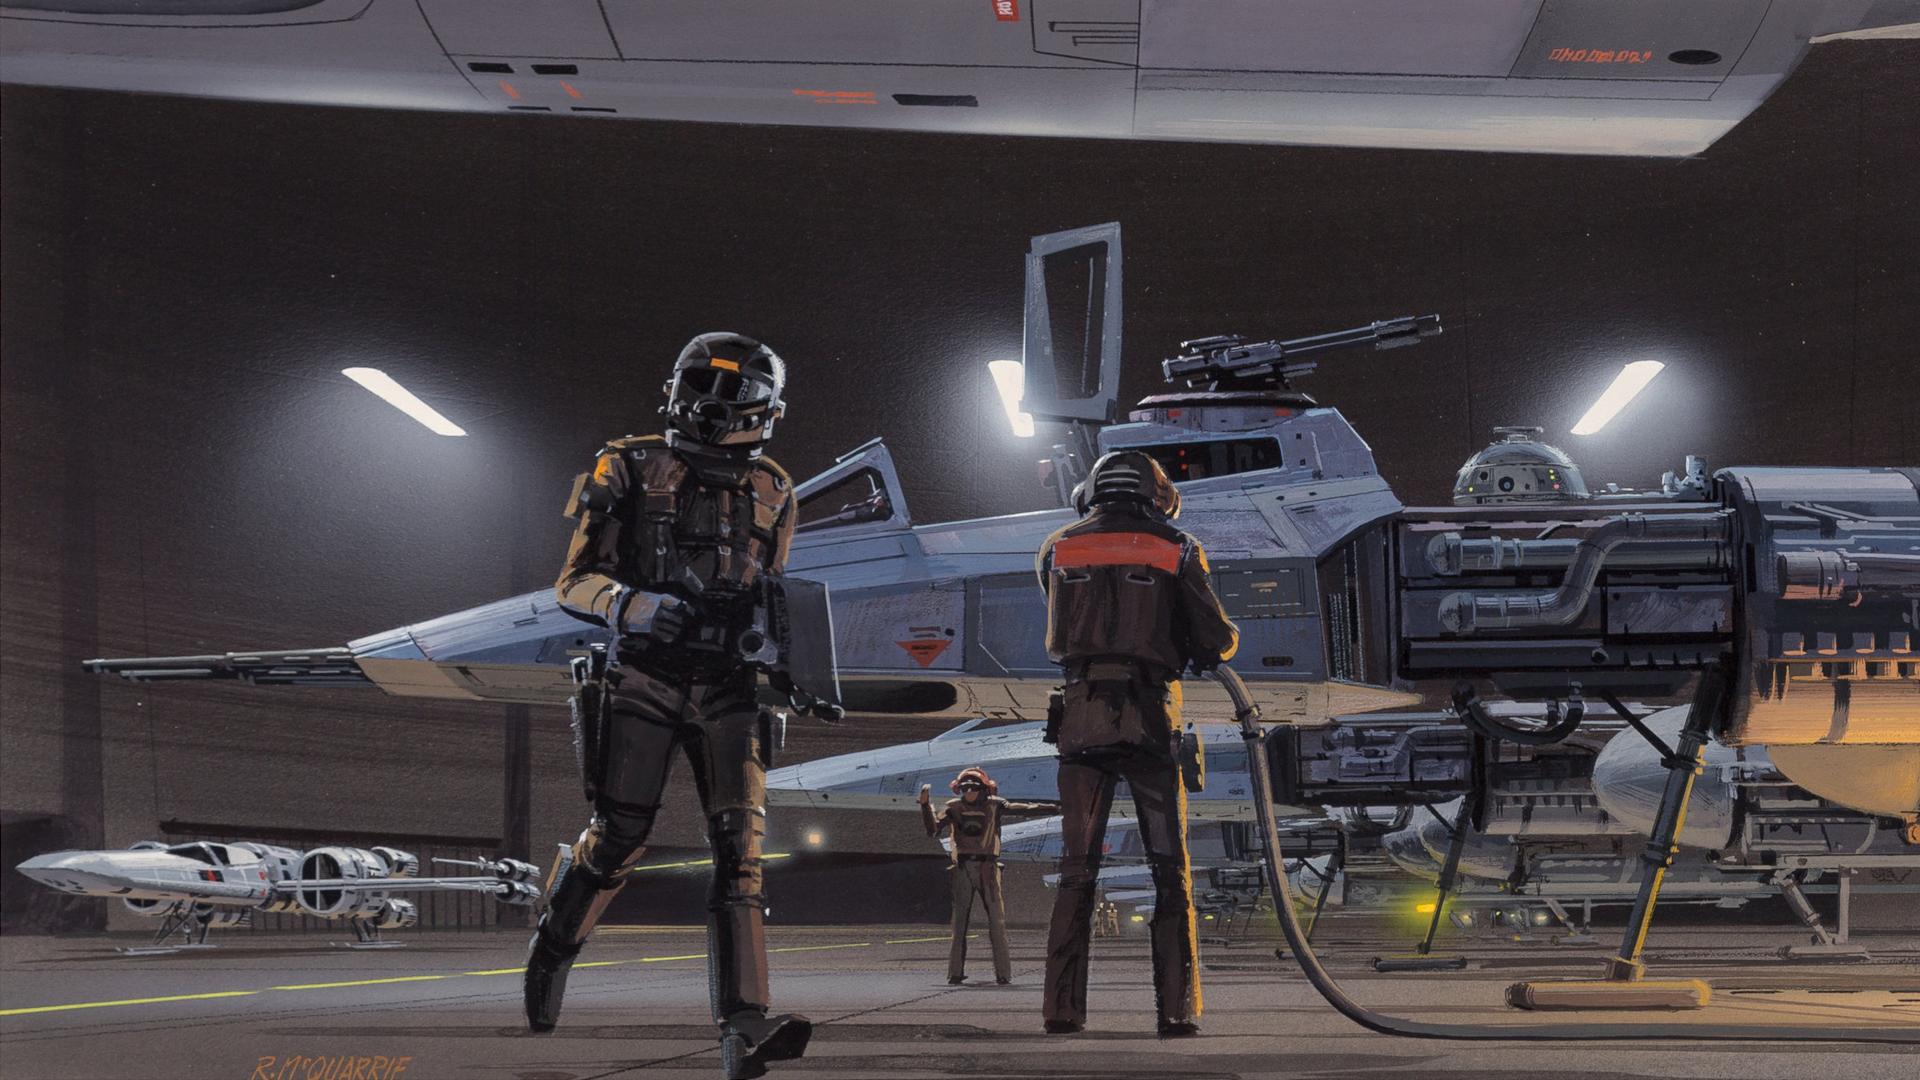 Wallpaper Star Wars Y Wing X Wing Hangar Rebel Alliance Artwork 1920x1080 Kmaco 1892951 Hd Wallpapers Wallhere